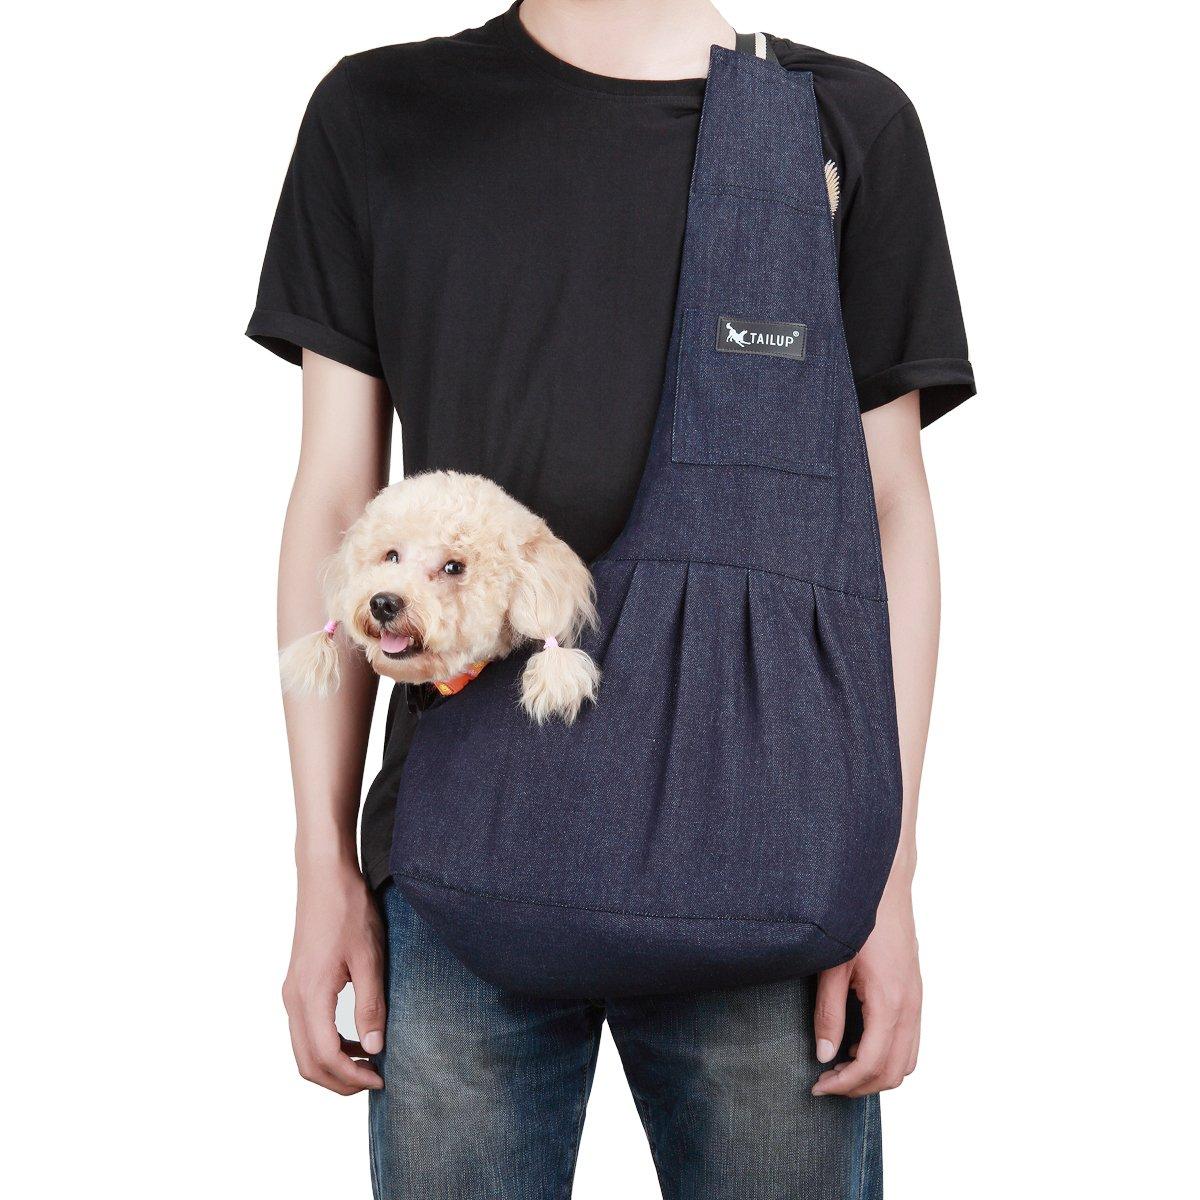 BLUE S TAIL UP Pet Carrier Sling, Shoulder Bag con Slide Strap regolabile per i piccoli cani, gatti o conigli, Hands -Free Outdoor Pet Carrier, Puppy Carrier Tragvel Bag (S, Blue)